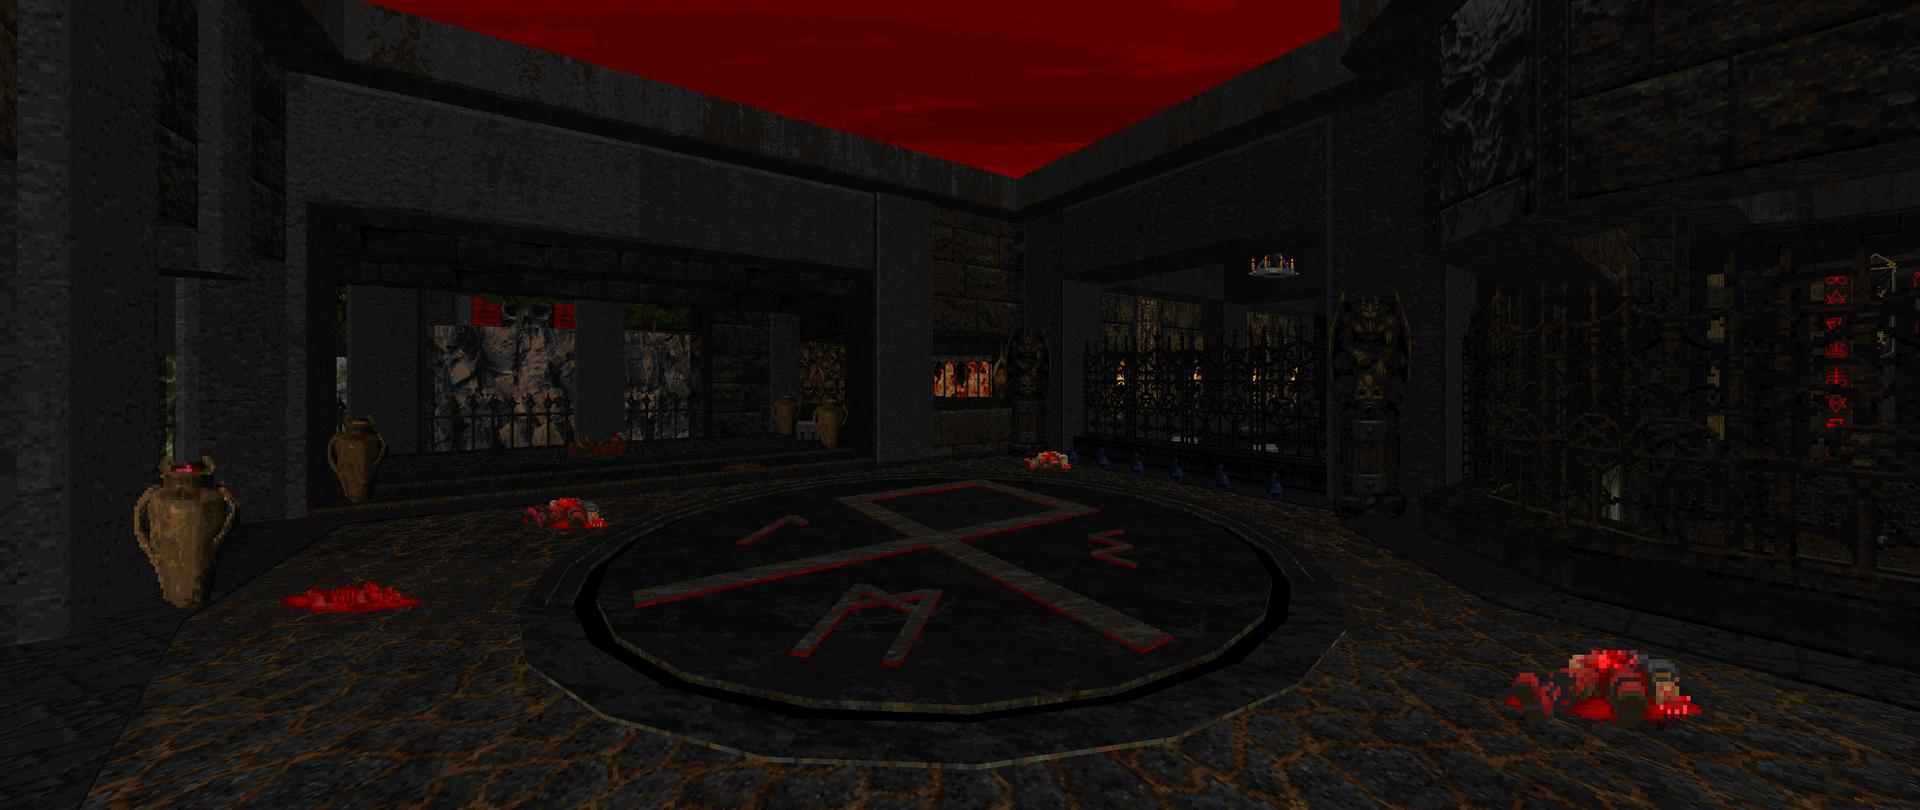 Screenshot_Doom_20191101_223447.png.67dd417904180016e19ff0752467bde7.png